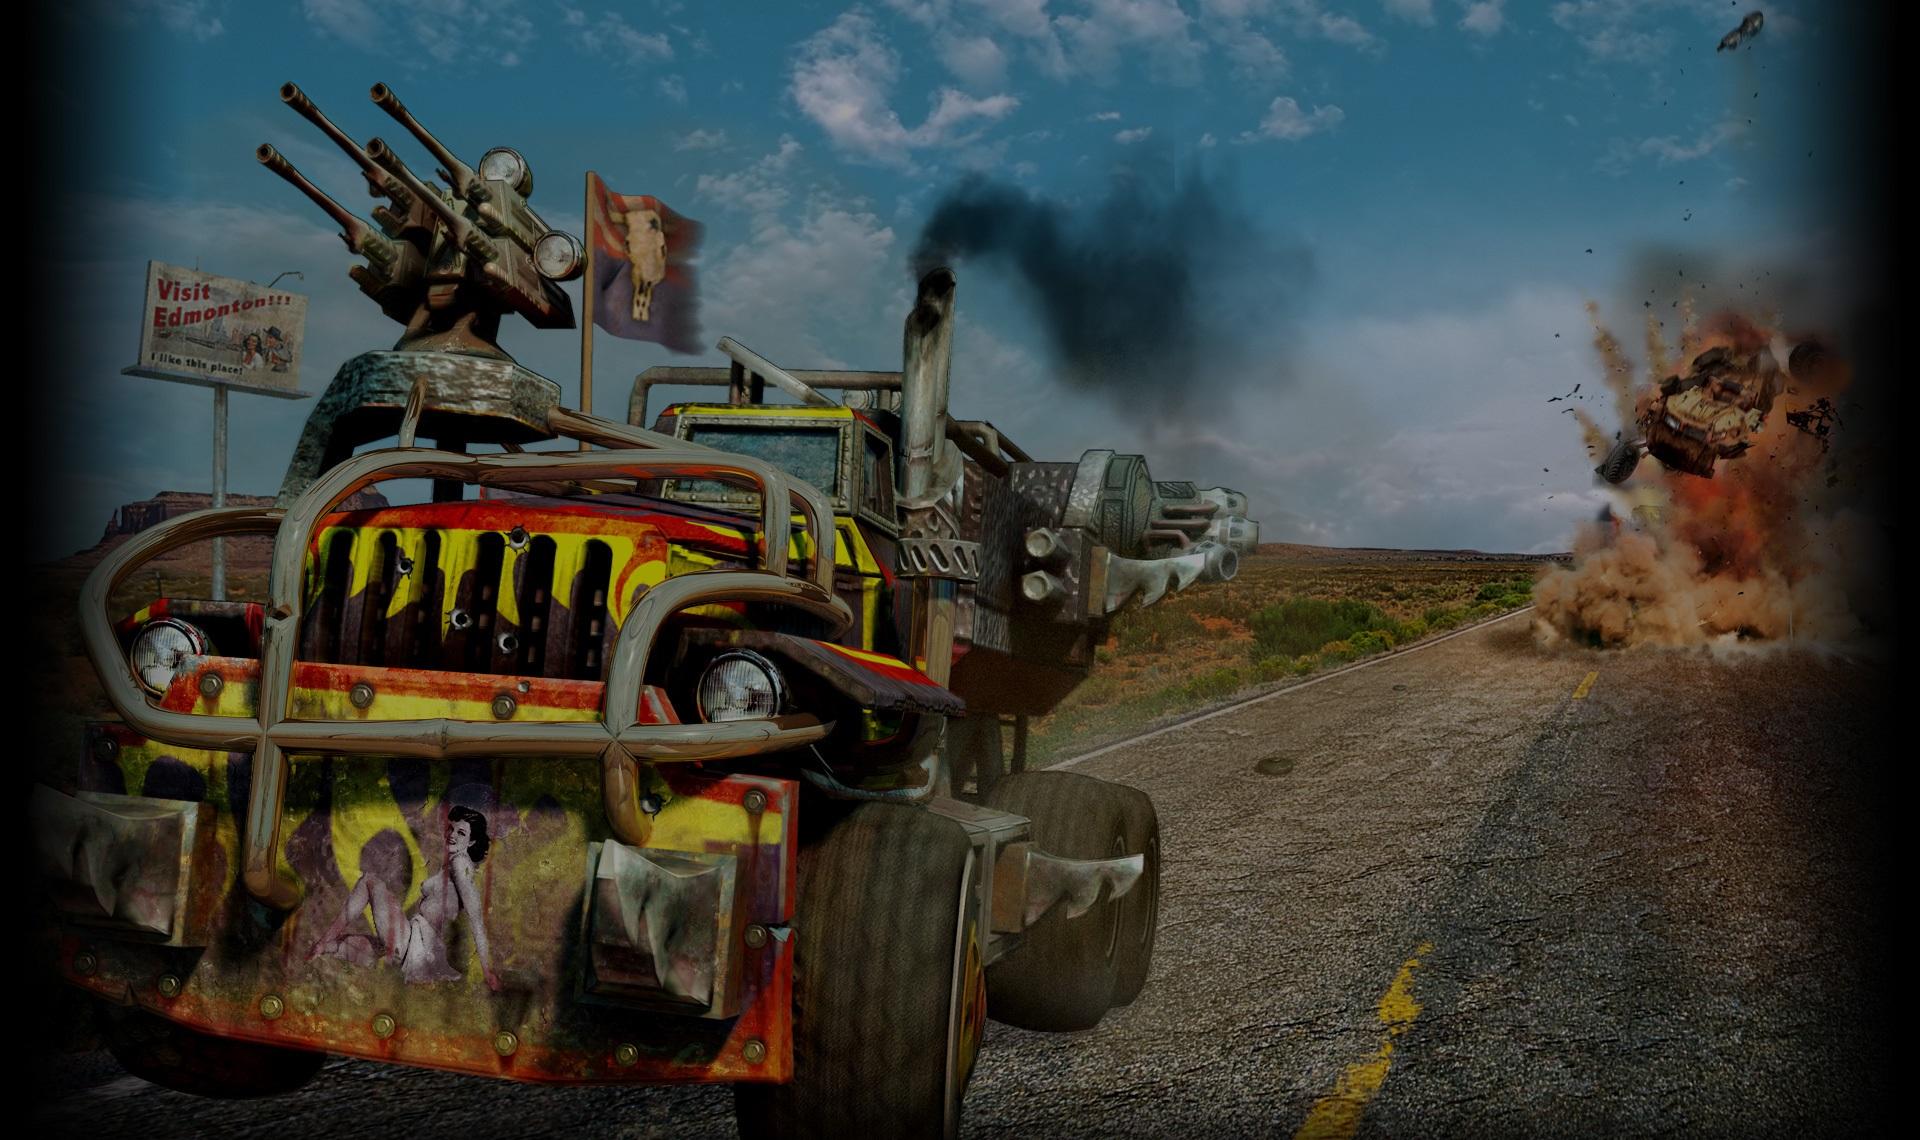 Hard Truck Apocalypse Wallpaper #3 (1600x1200)